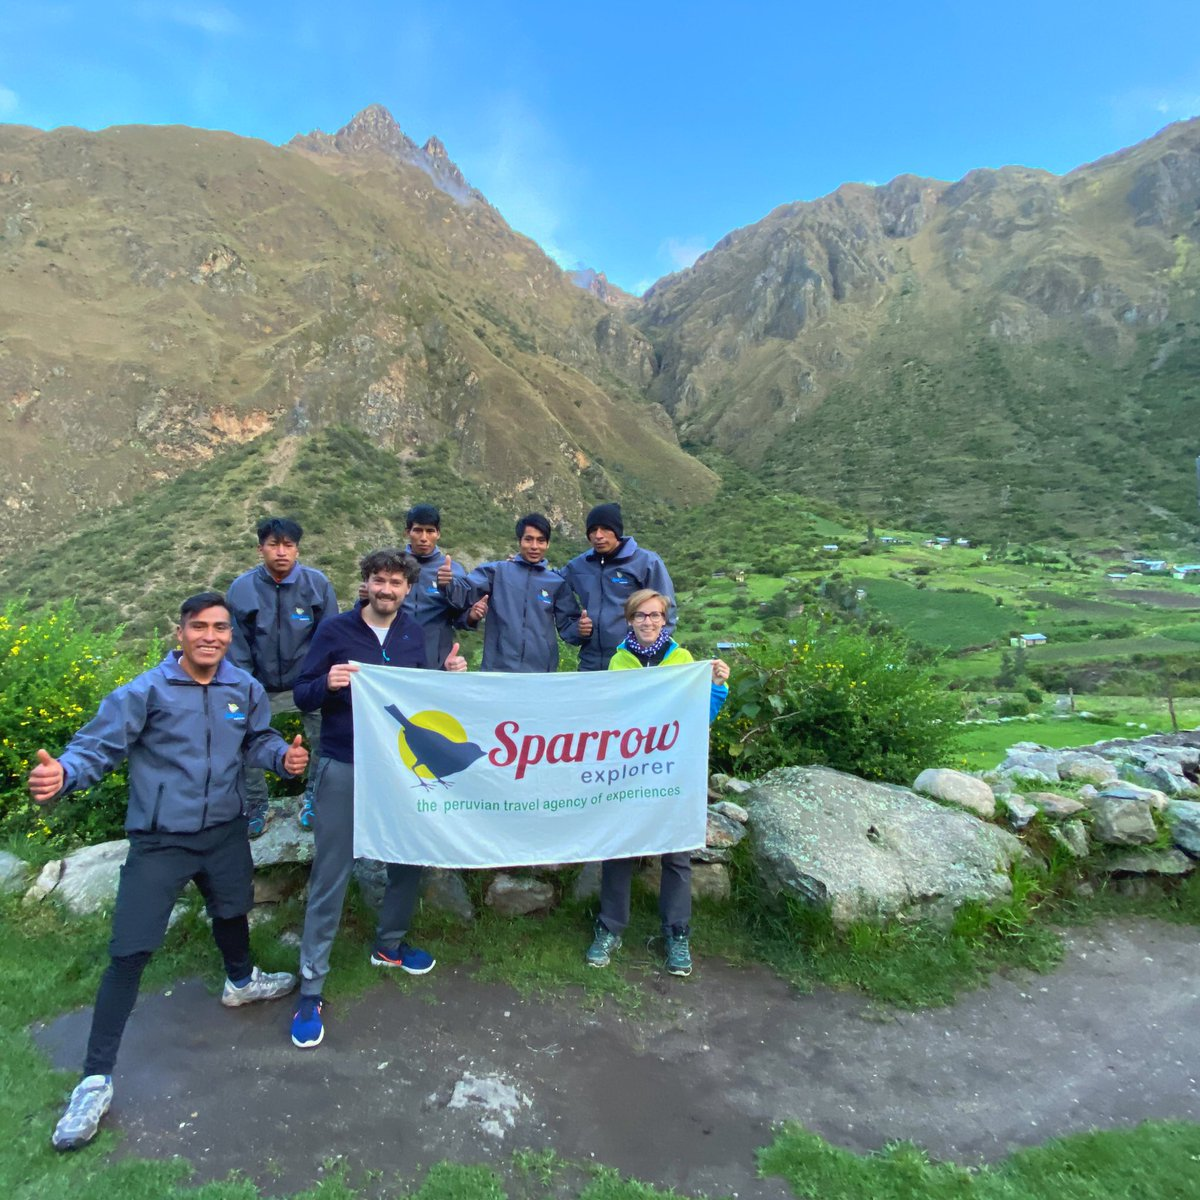 Team of Classic Inca trail to #Machupicchu !!! #travelphotography #naturephotography #trip #travelblogger #naturelovers #ctperu #nature_perfection #trekking #hike #cusco #wonderlust #america #mountains #explore #love #lonelyplanet #natgeo #discovery #lifestyle #stayhome #ruinspic.twitter.com/fhiBRtNYgY